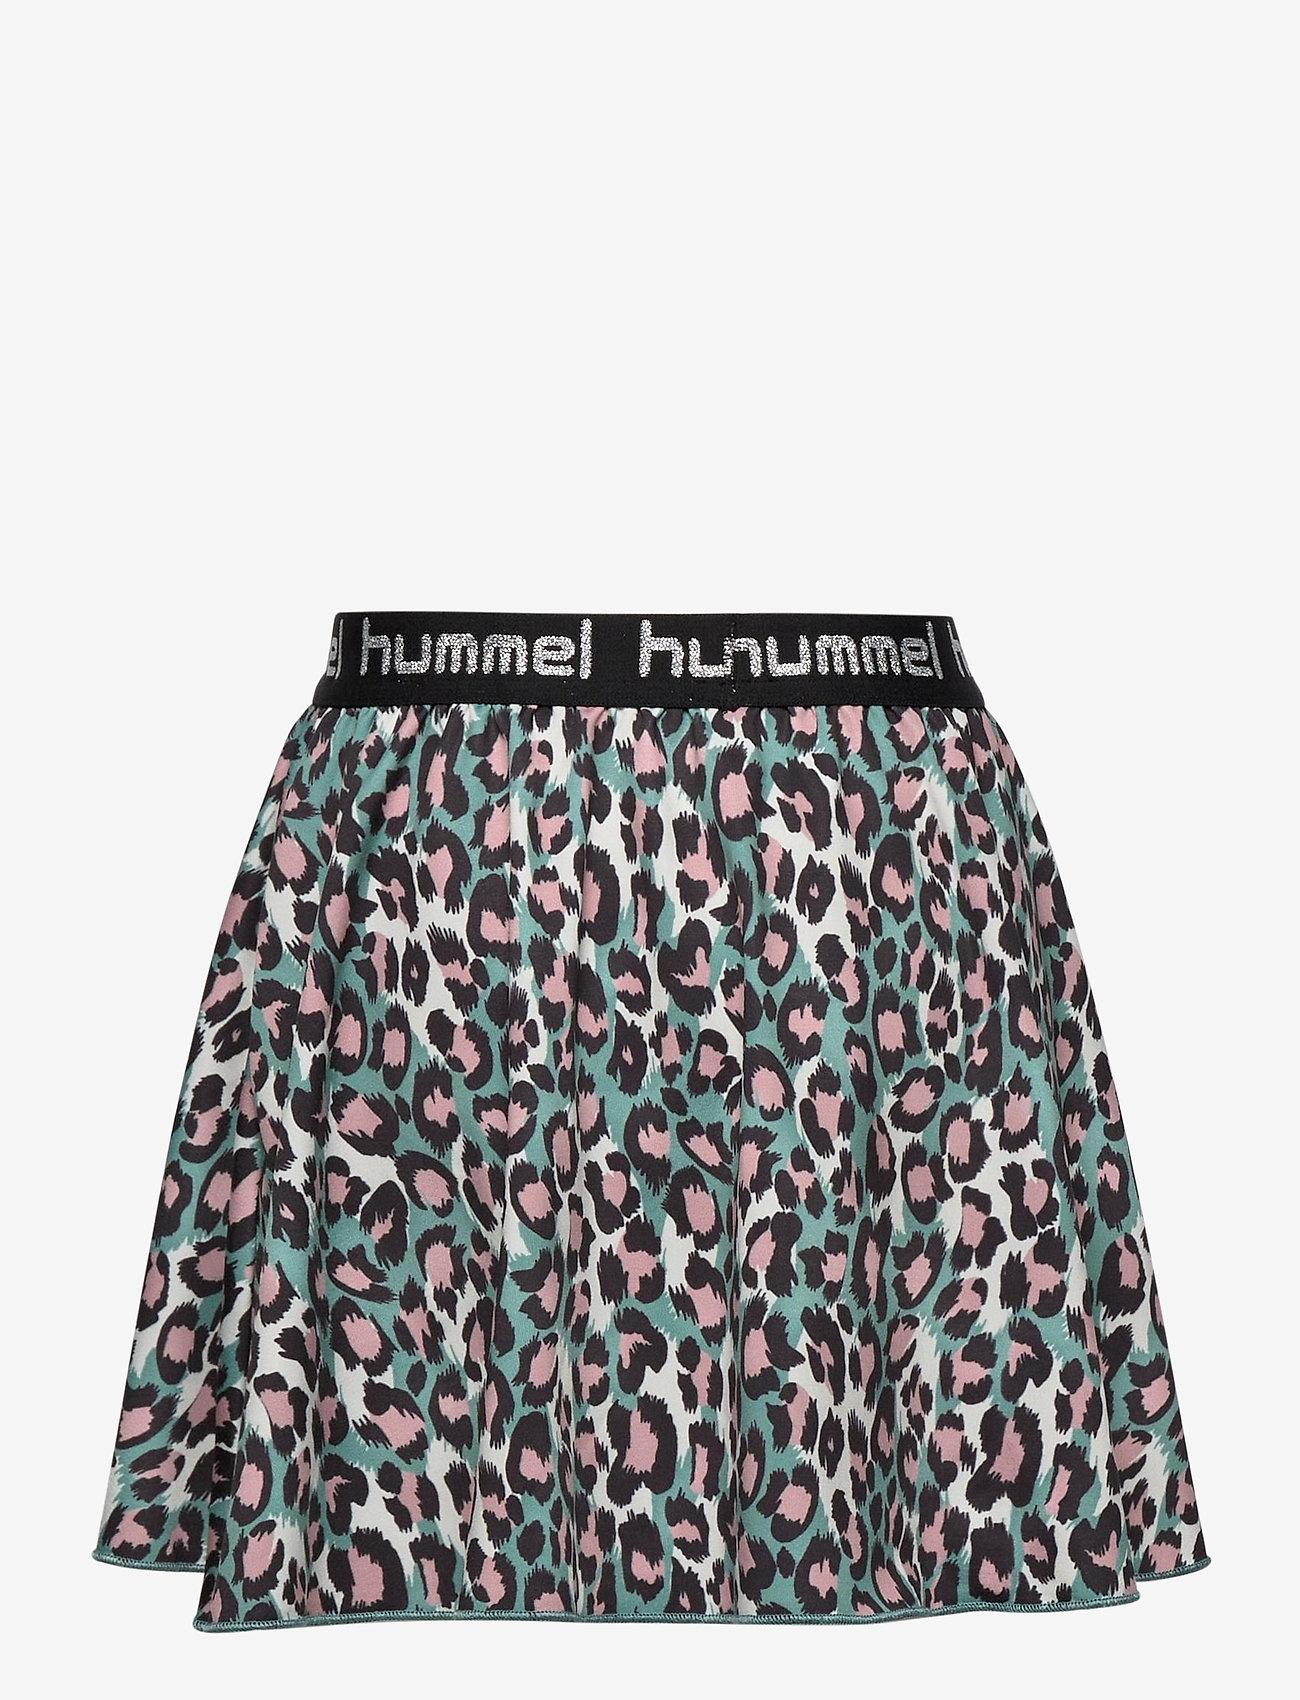 Hummel - hmlNANNA SKIRT - spódnice - oil blue - 1